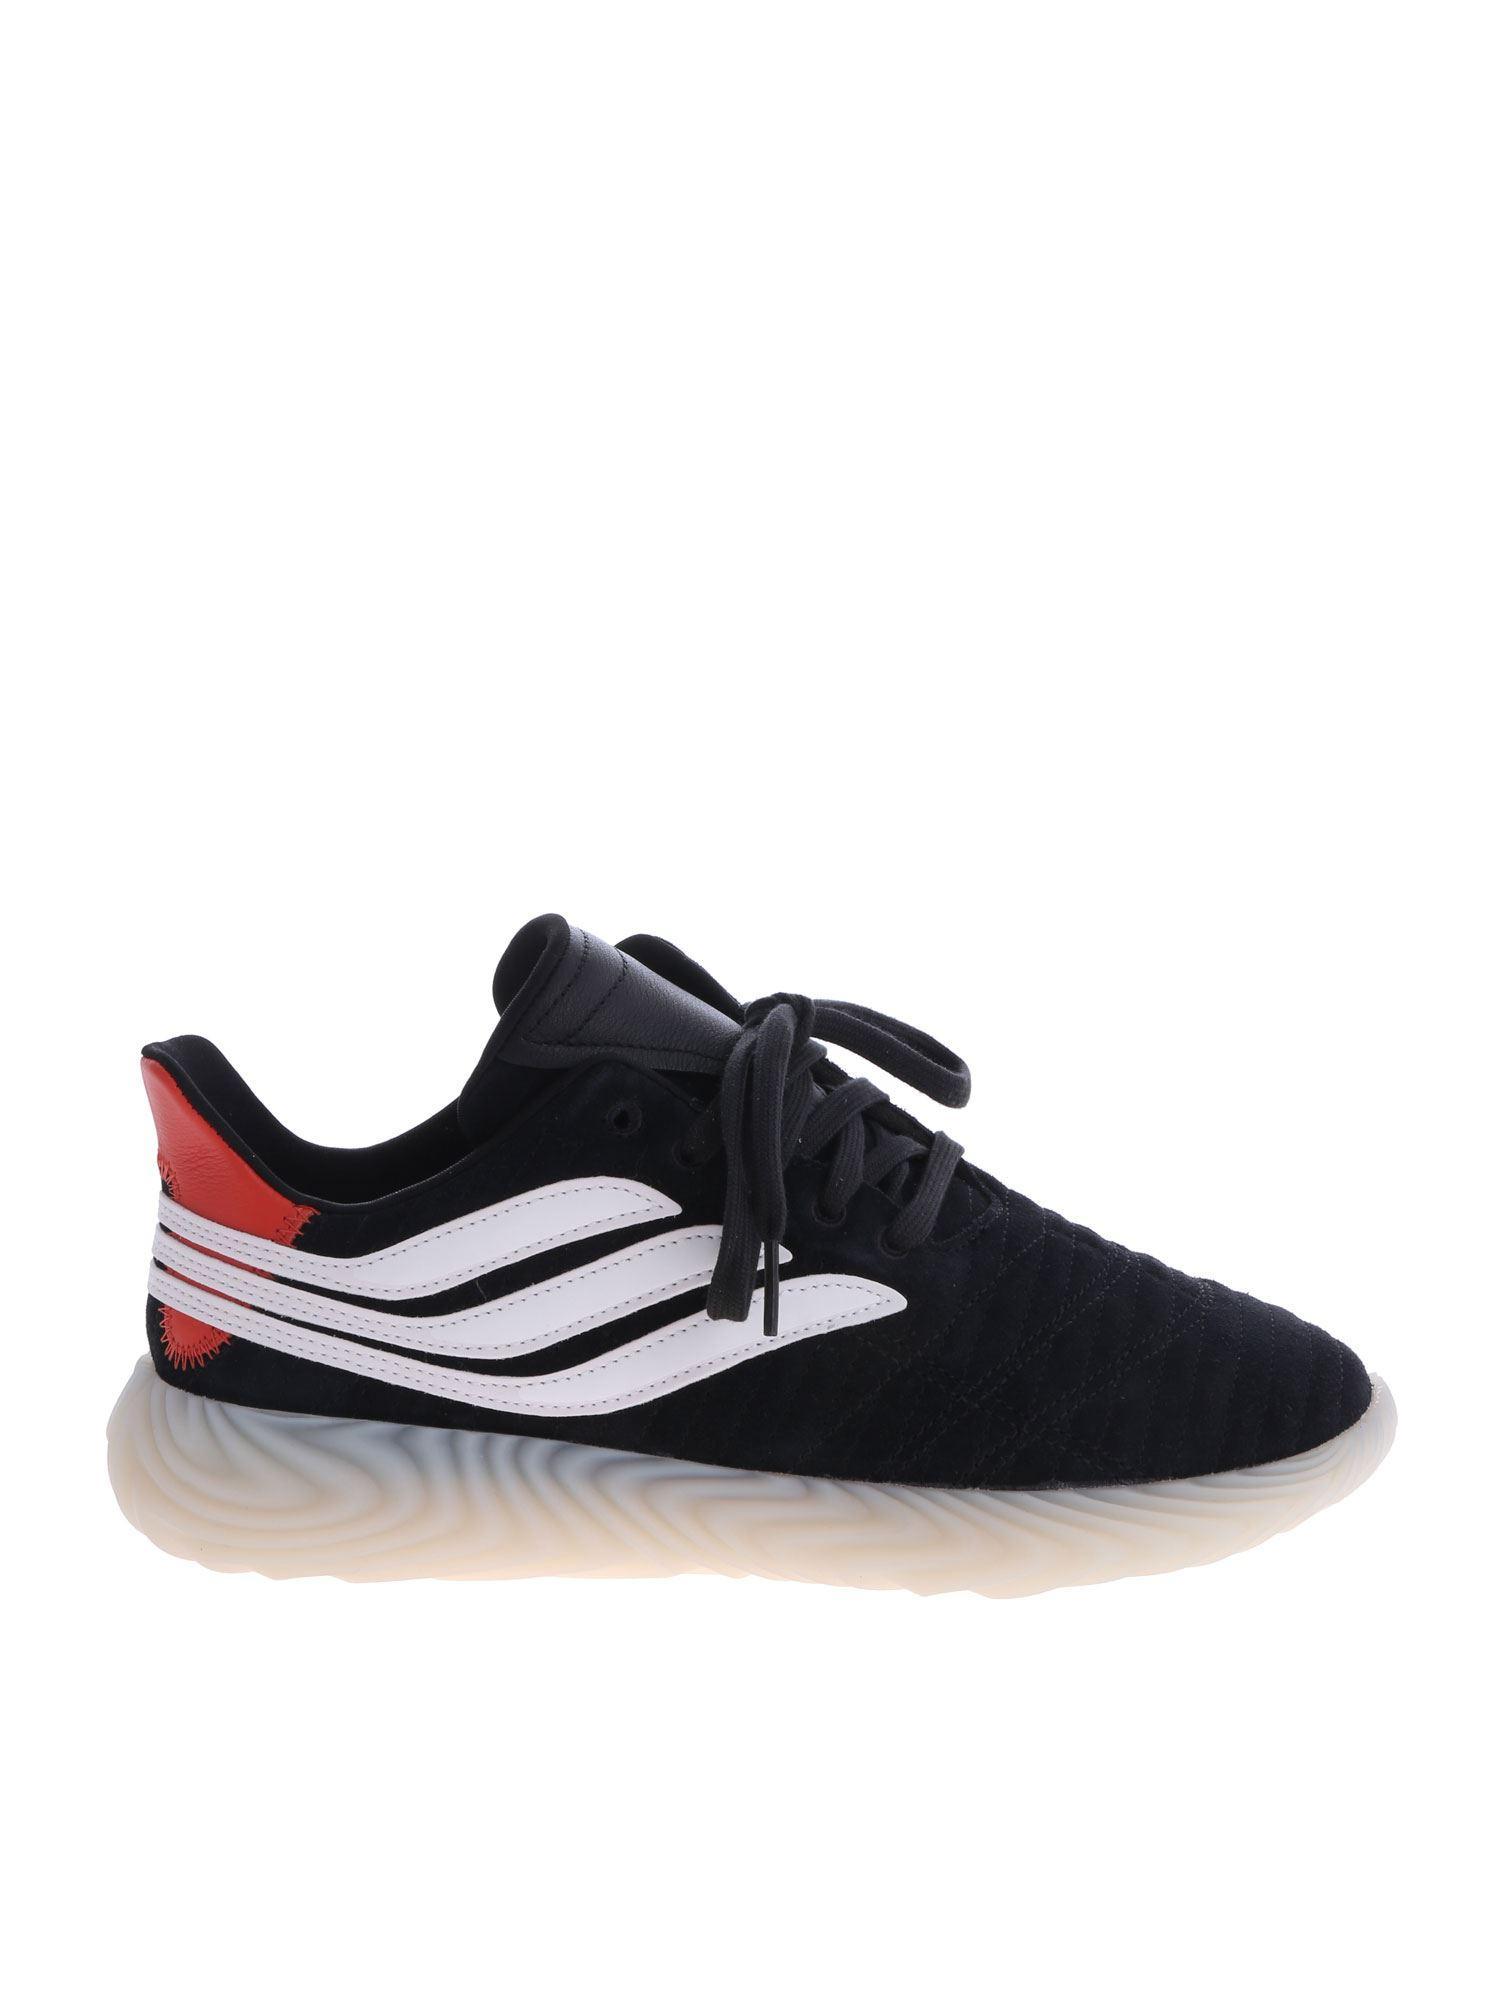 best service eeaae fef09 adidas Originals. Men s Black Sobakov Sneakers